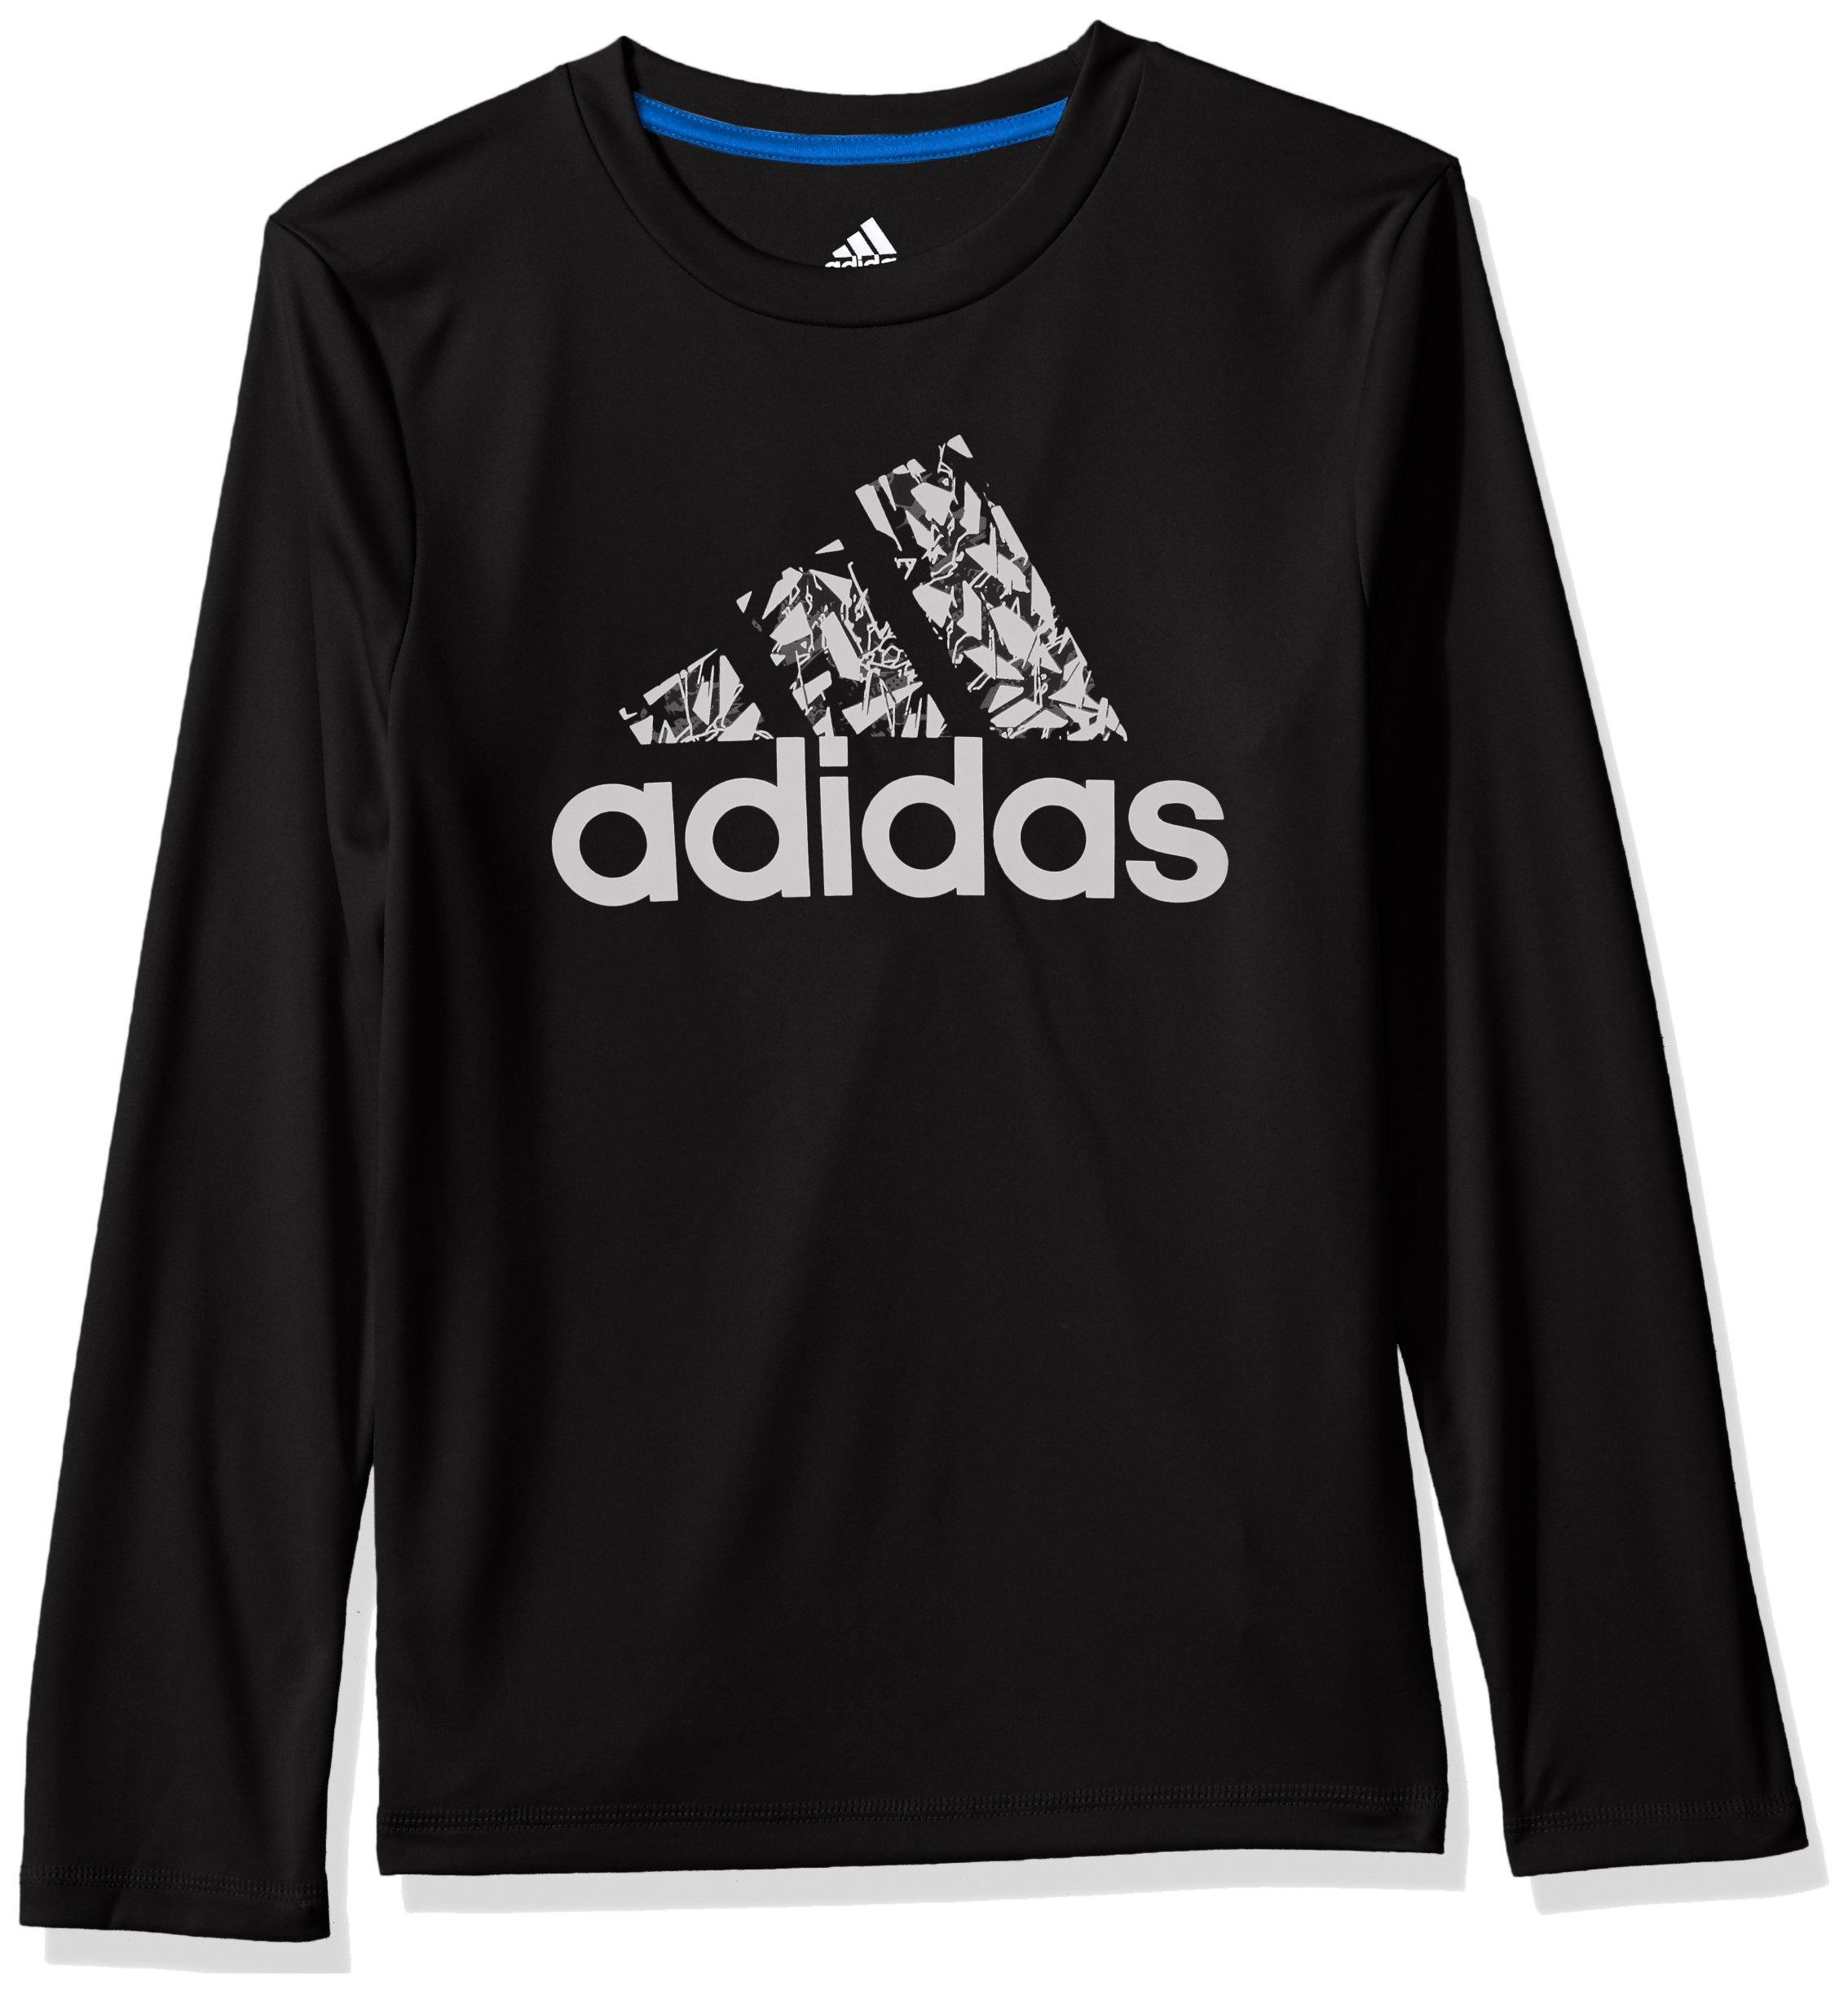 adidas Big Boys' Basic Long Sleeve Tee Shirt, Midnight, M